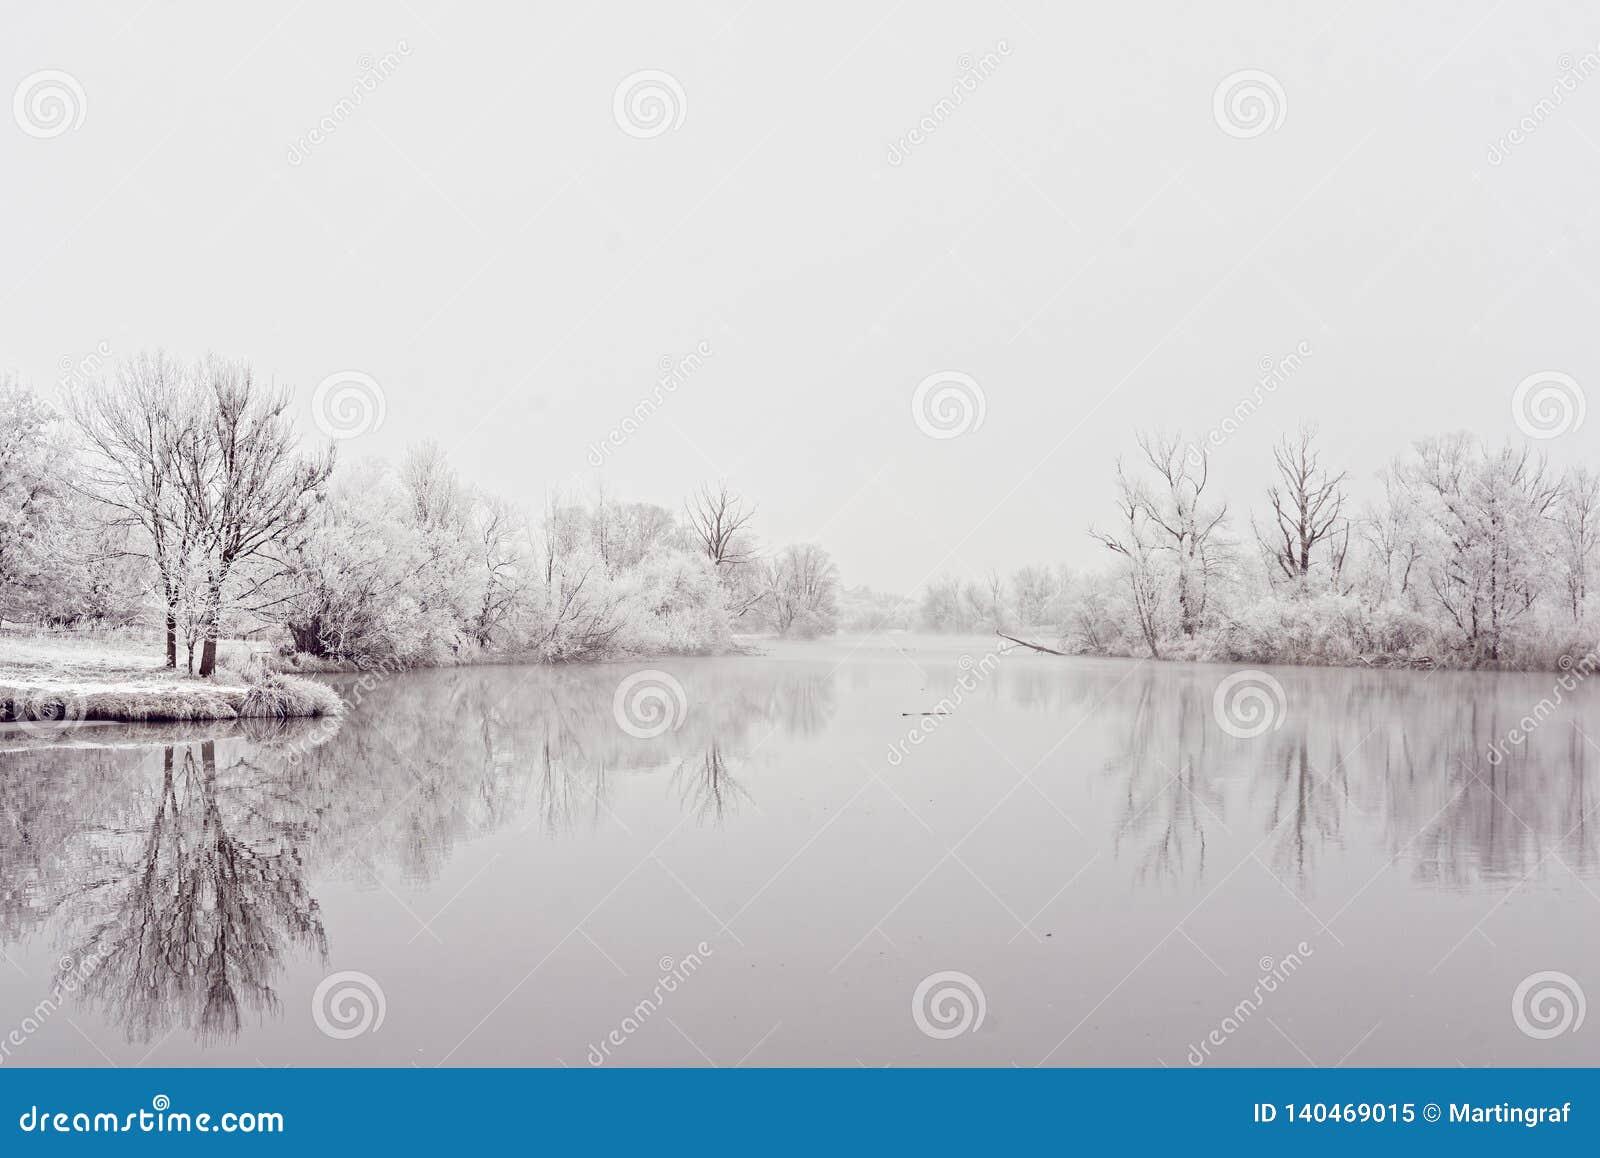 River landscape riparian area winter idyll